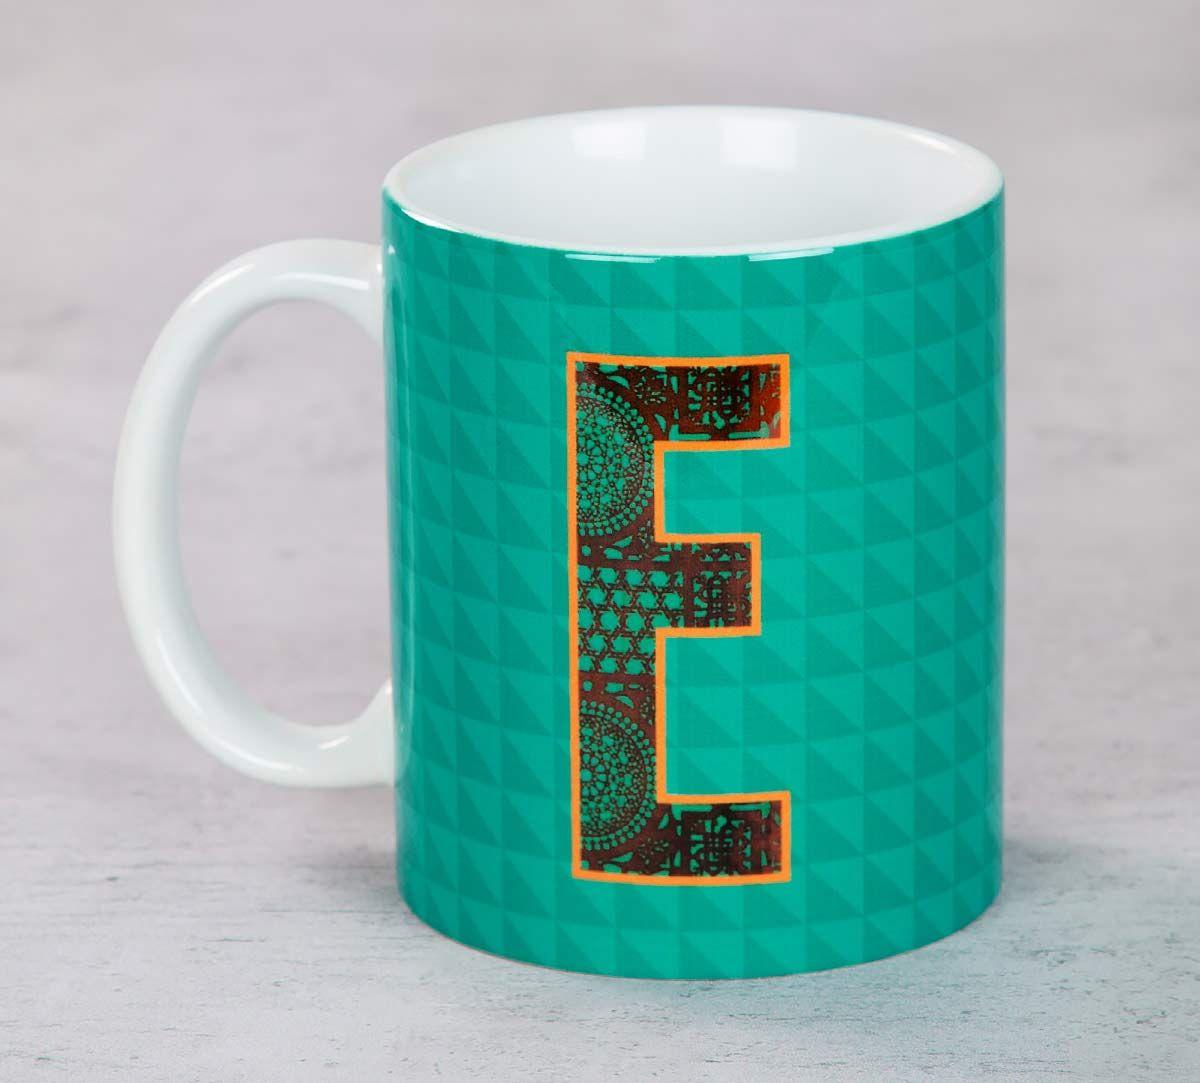 Rugged Earthern Coffee Mug